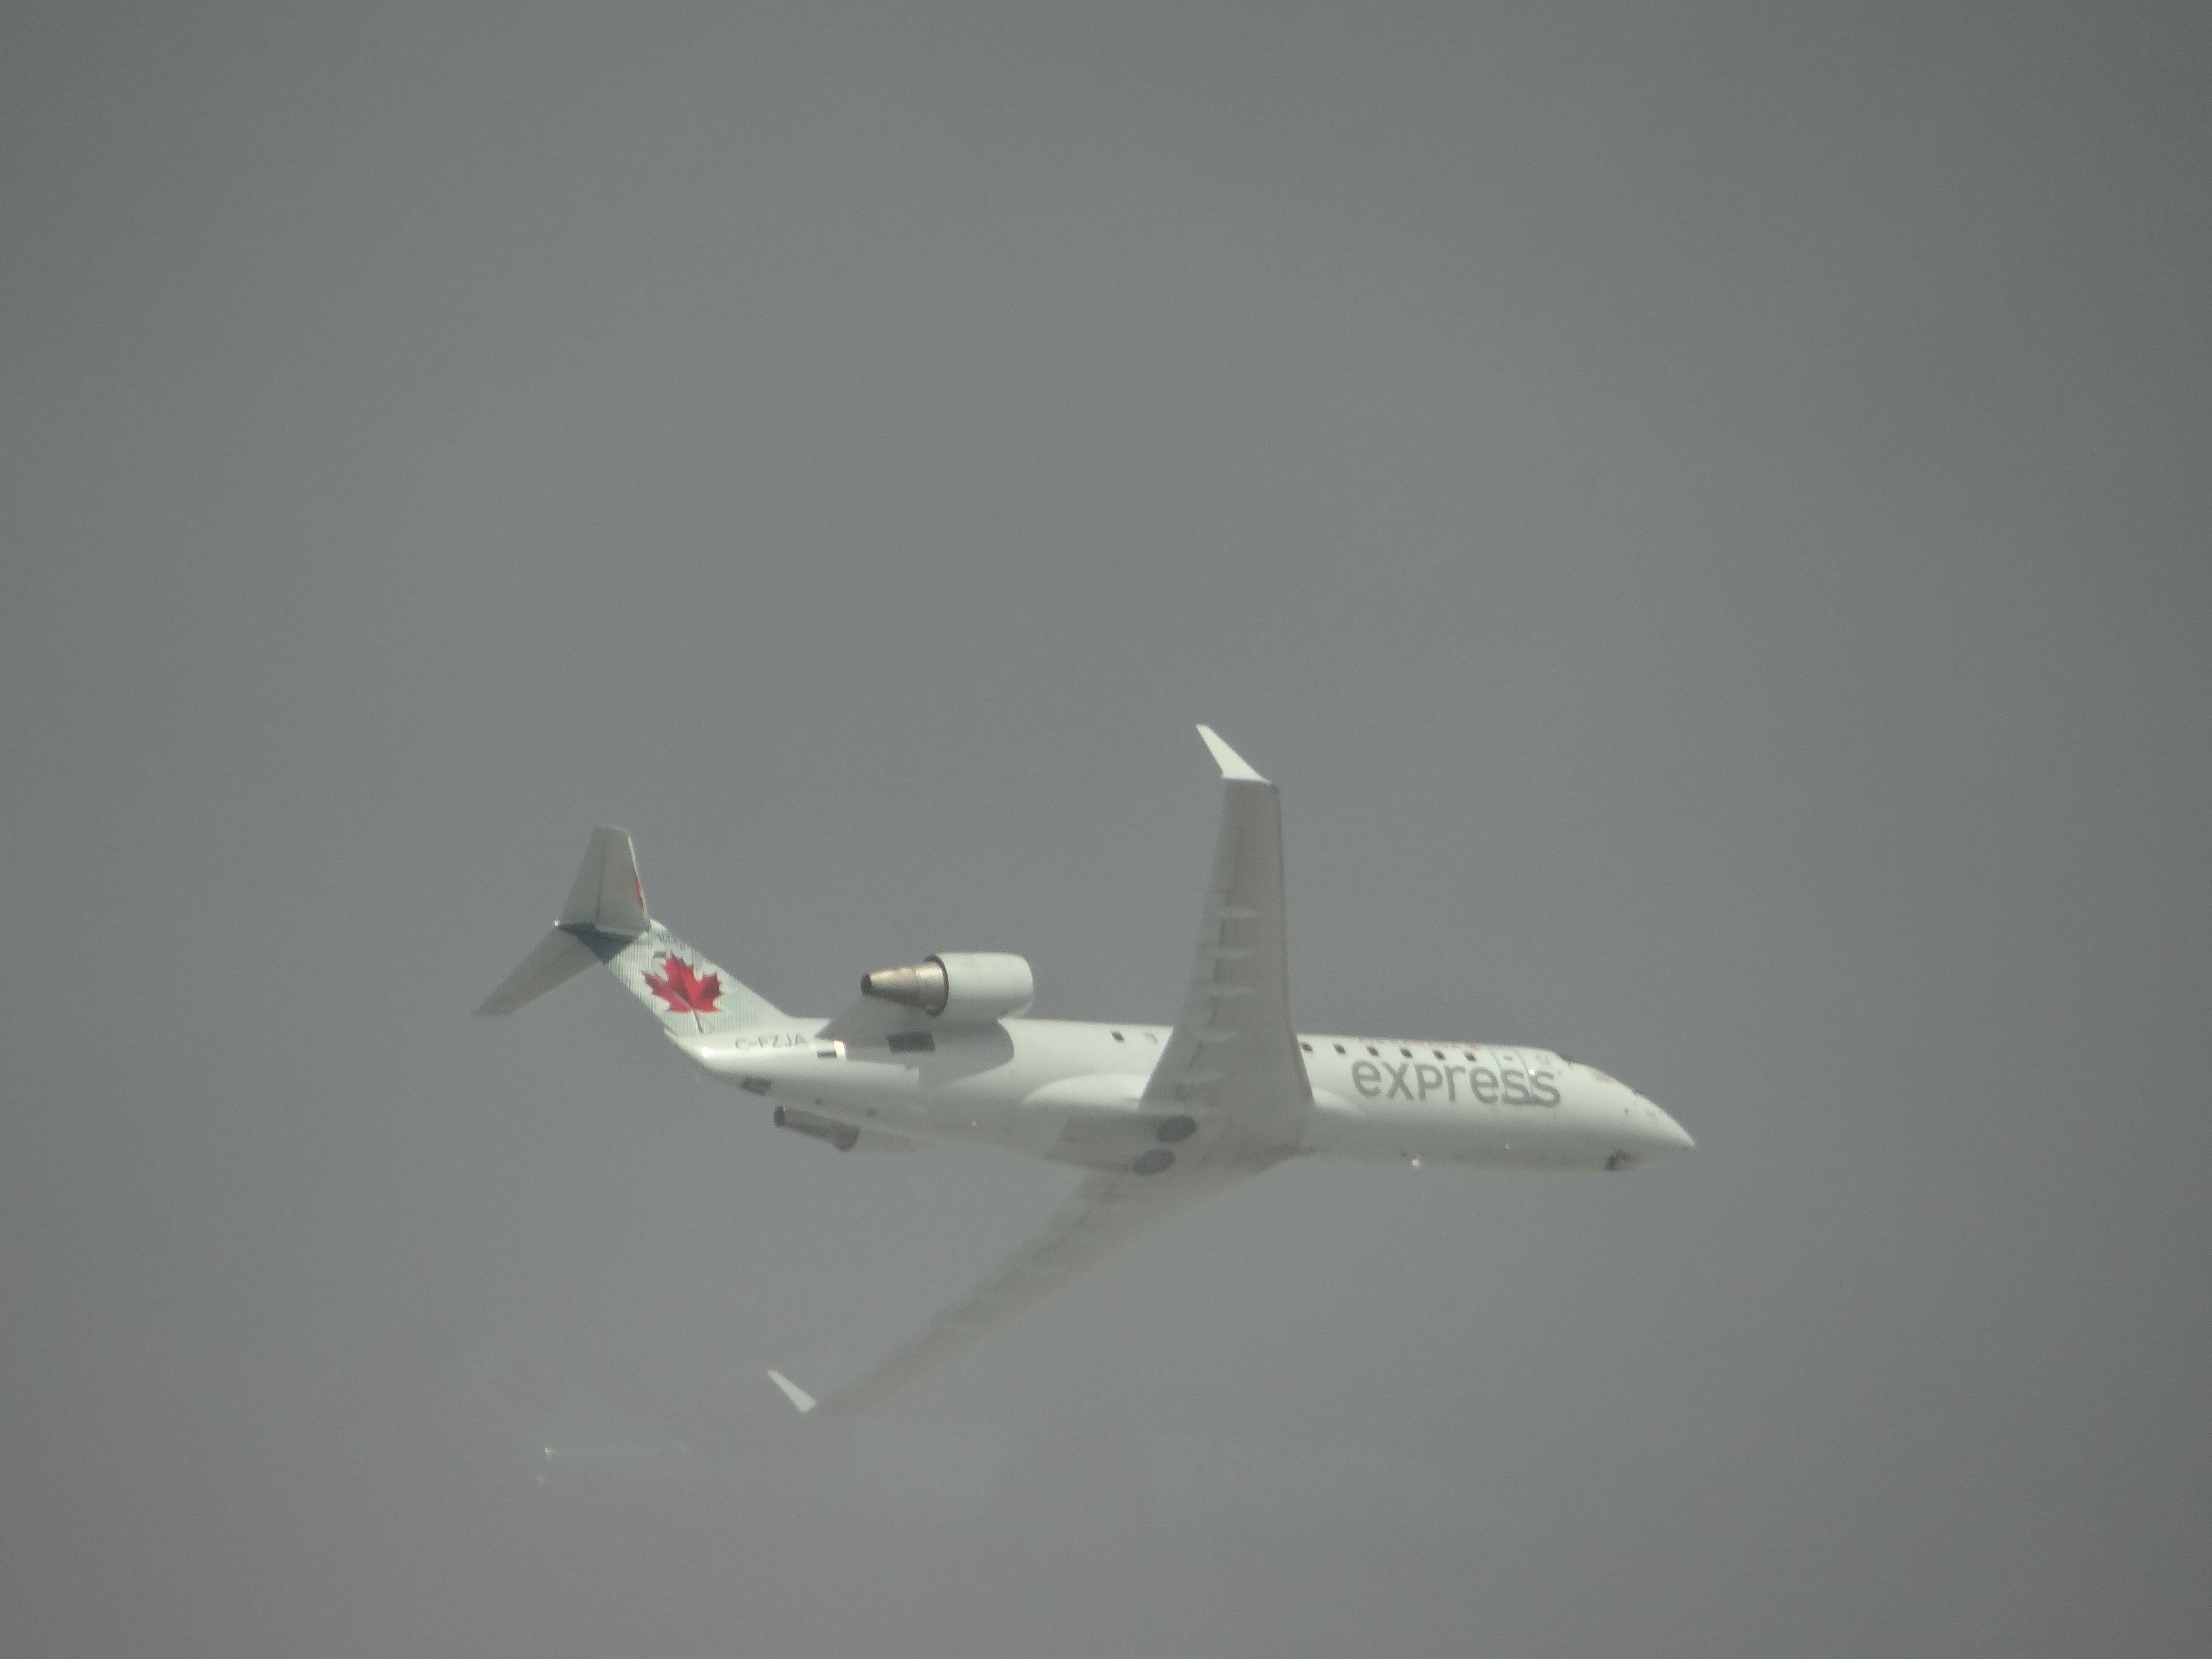 Air Canada, Aéroport de Montréal. Canada, Aéroport, Montréal